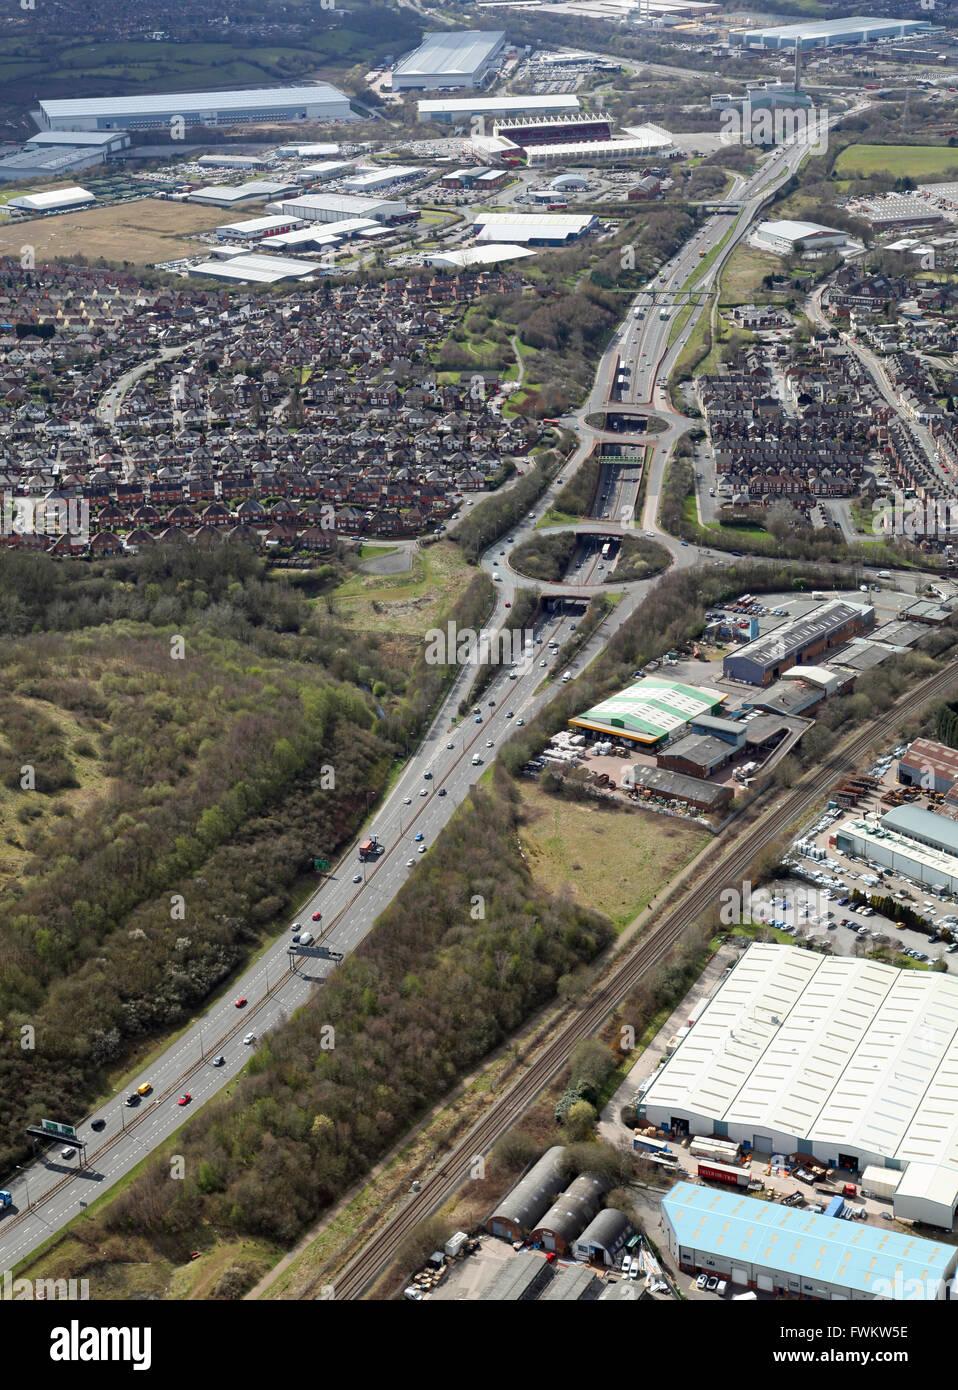 Vista aérea de la carretera A50, ya que pasa a través de Stoke-on-Trent, Staffordshire, REINO UNIDO Imagen De Stock